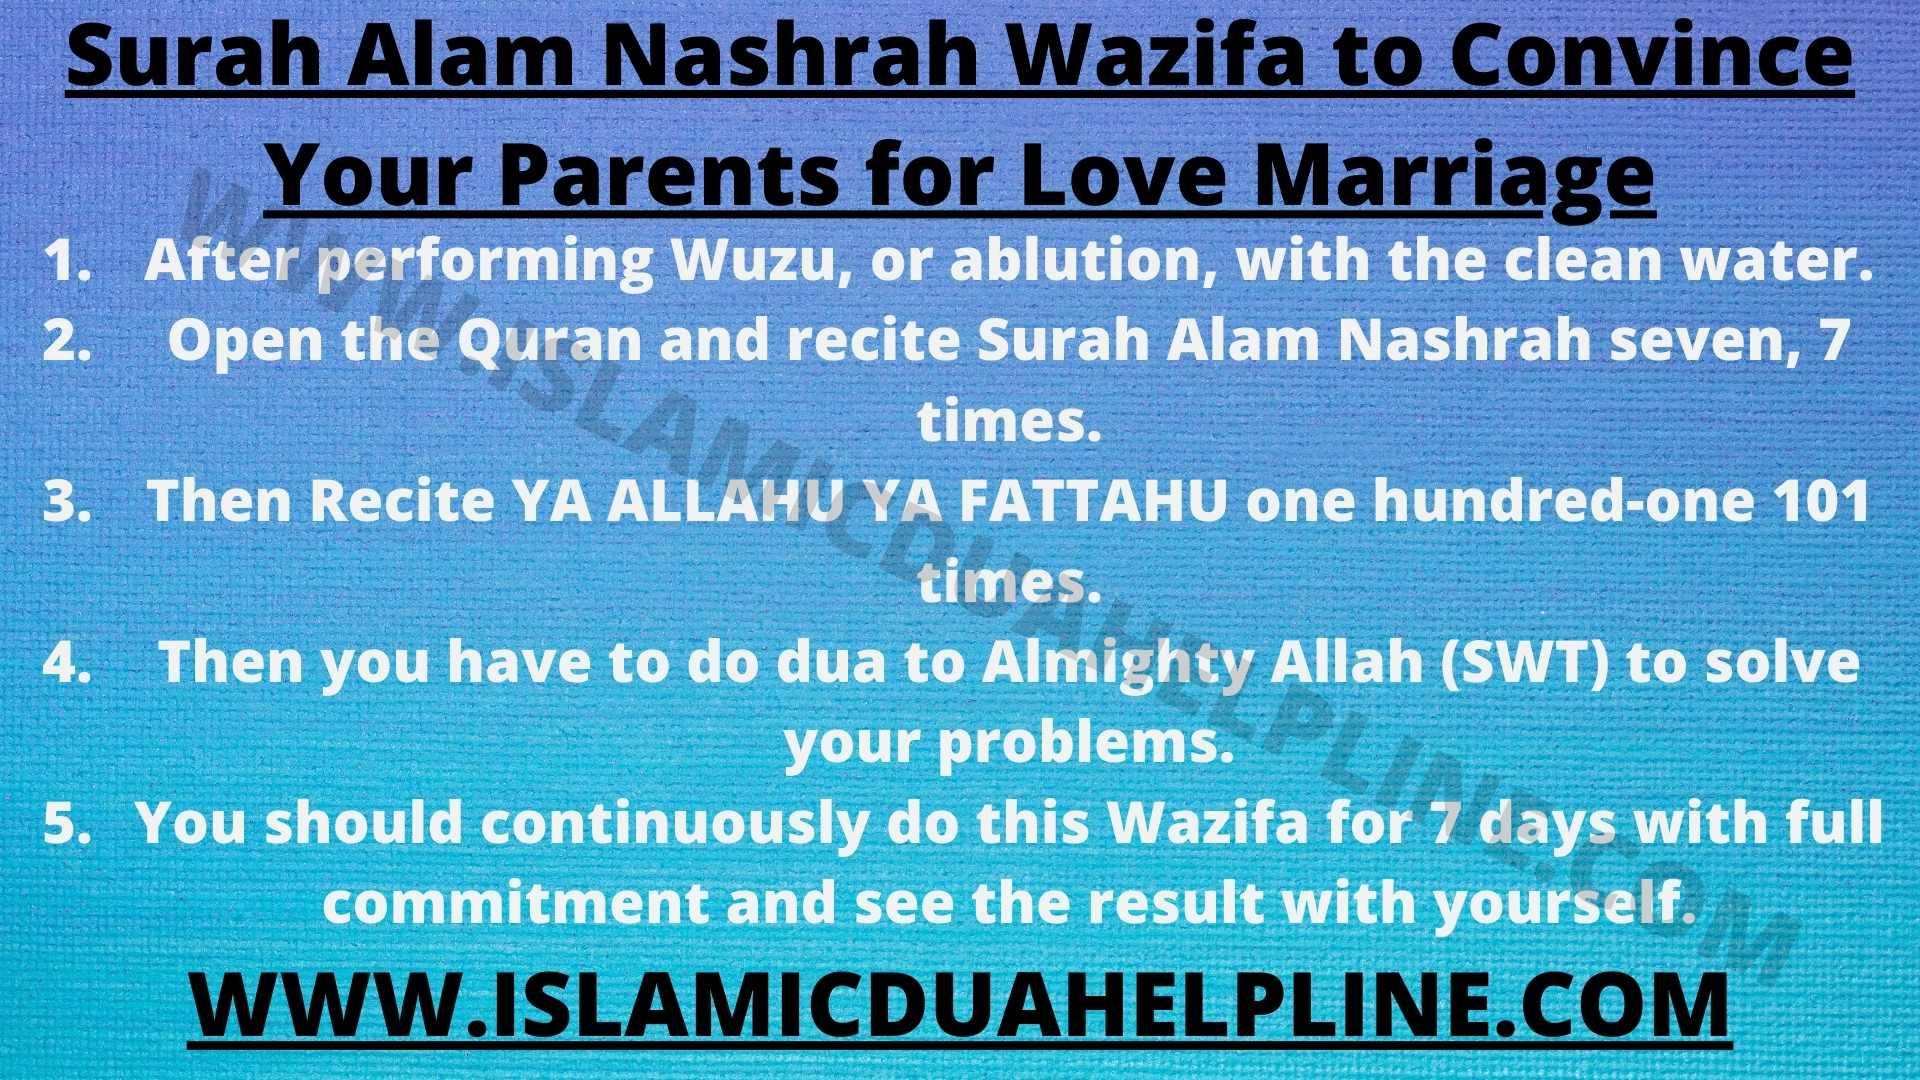 Surah Alam Nashrah Wazifa to Convince Your Parents for Love Marriage